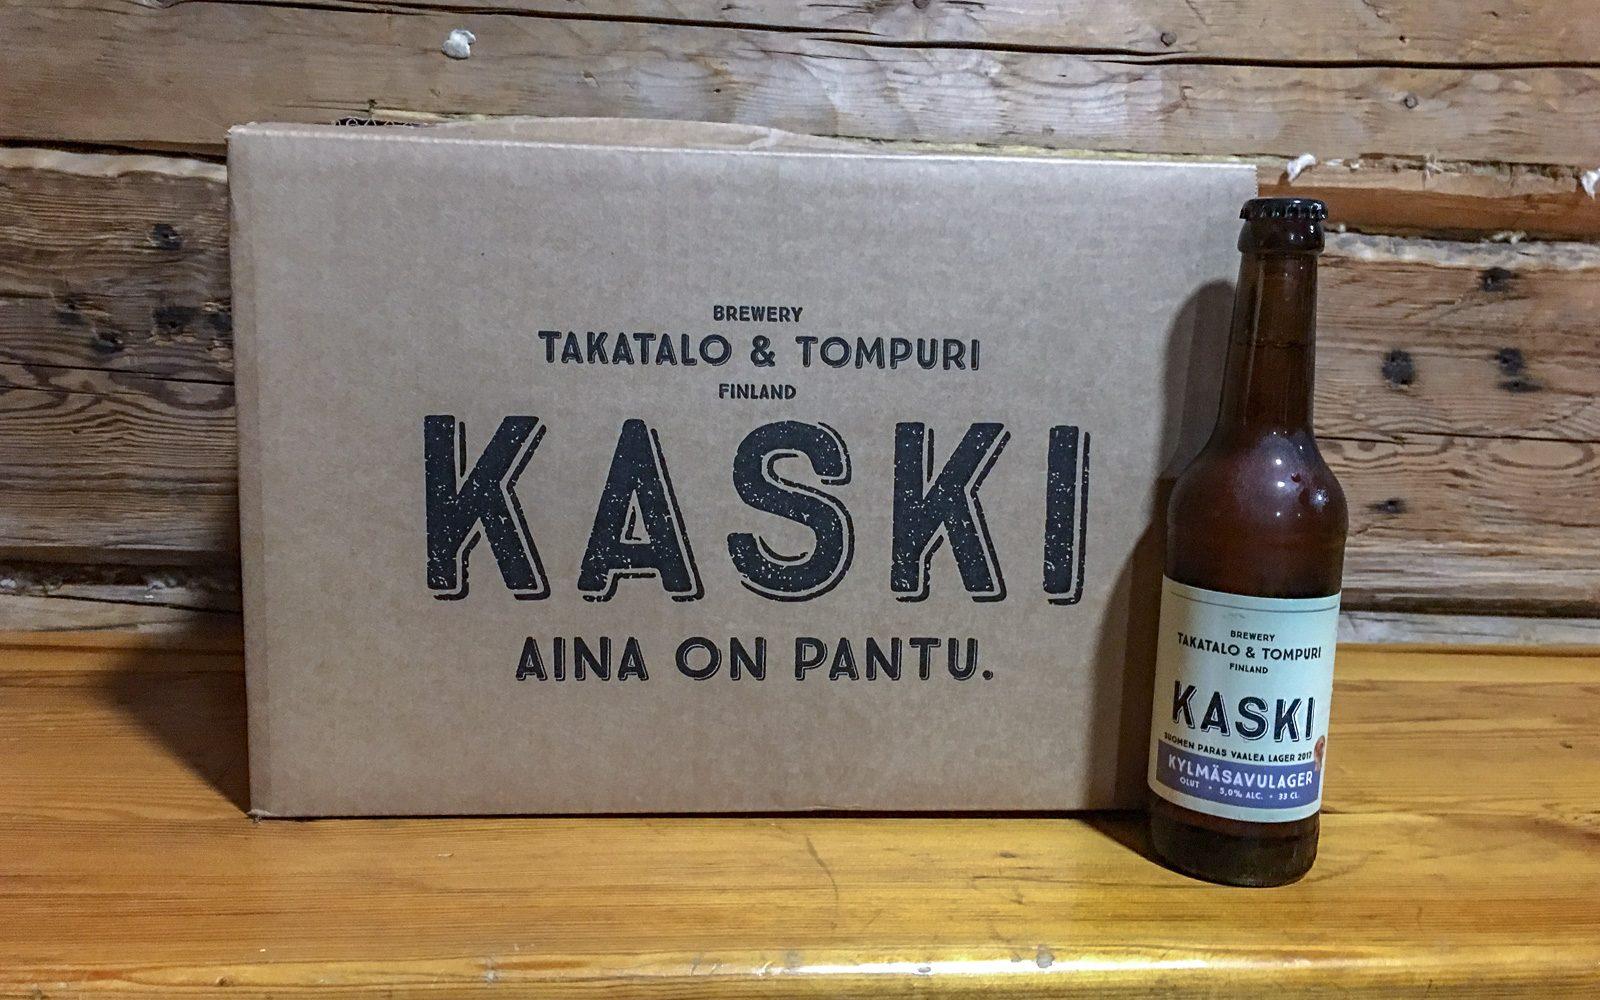 Takatalo & Tompuri oluet